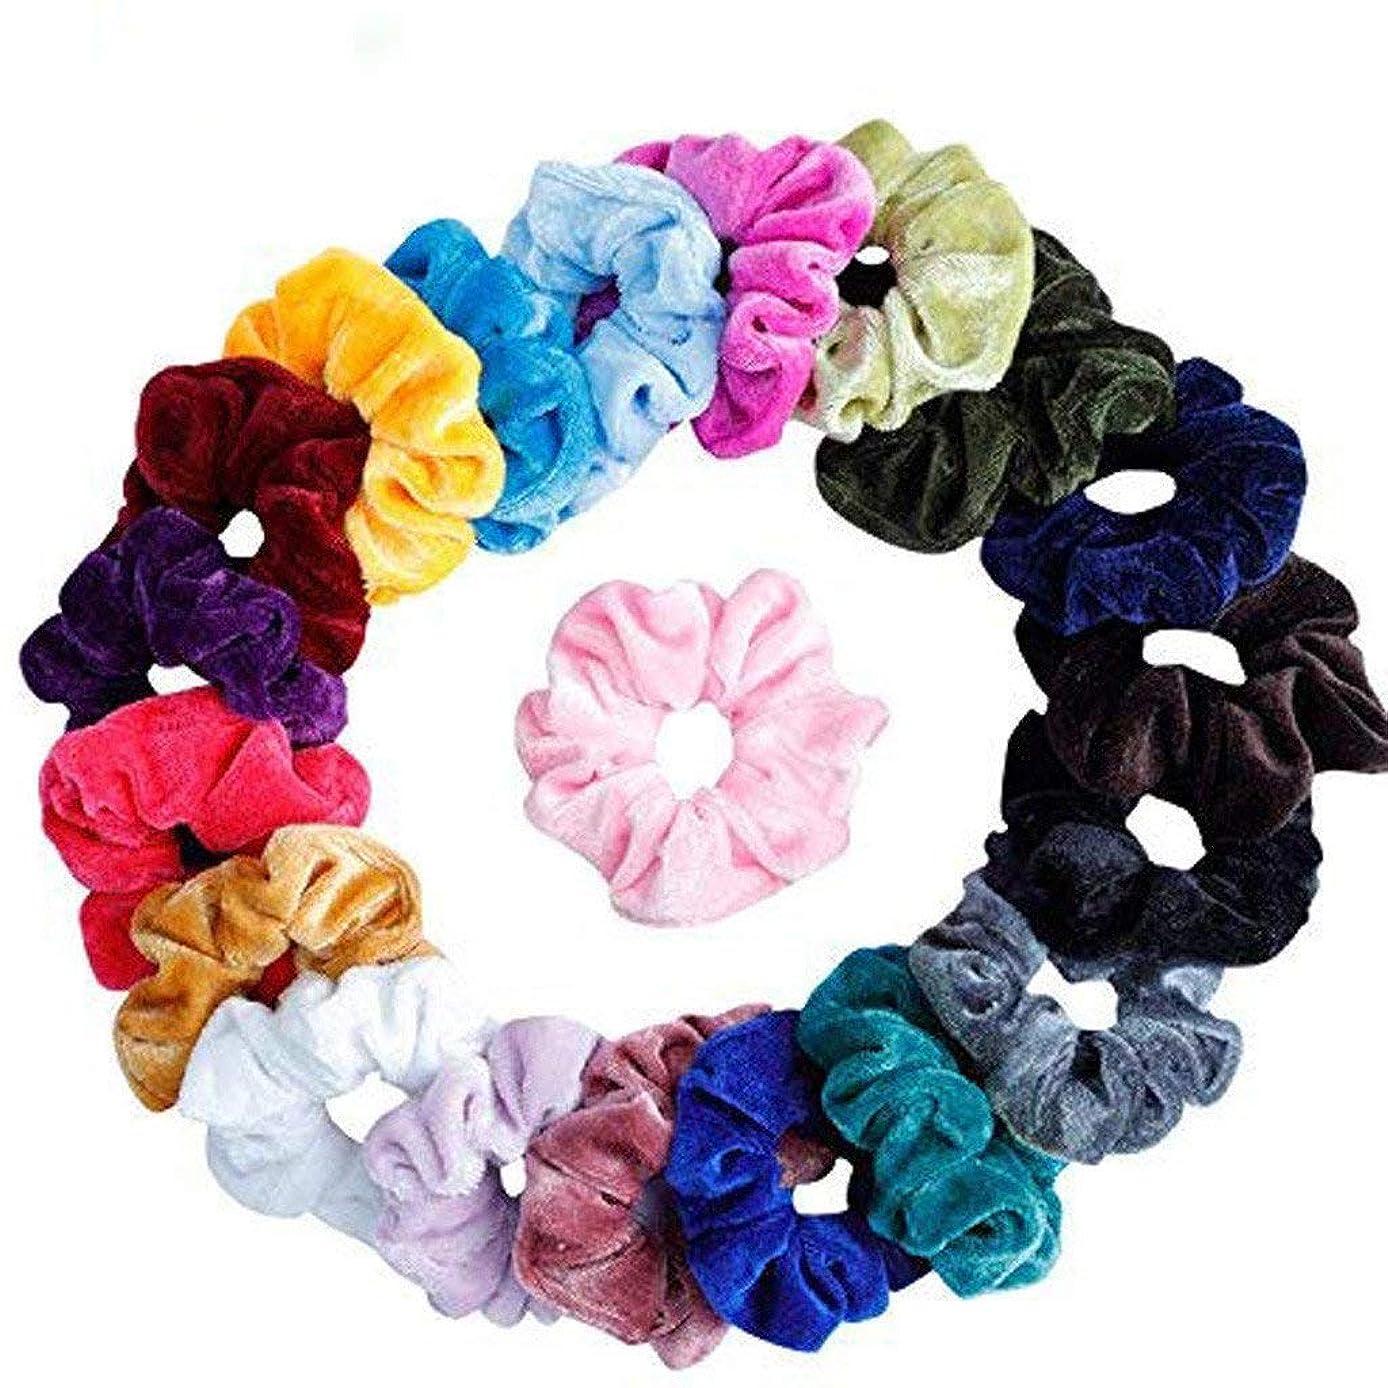 Dressin 20 Pcs Hair Elastic Hair Bands,Hair Ties Flowers Ropes for Women or Girls Hair Accessories -20Pcs